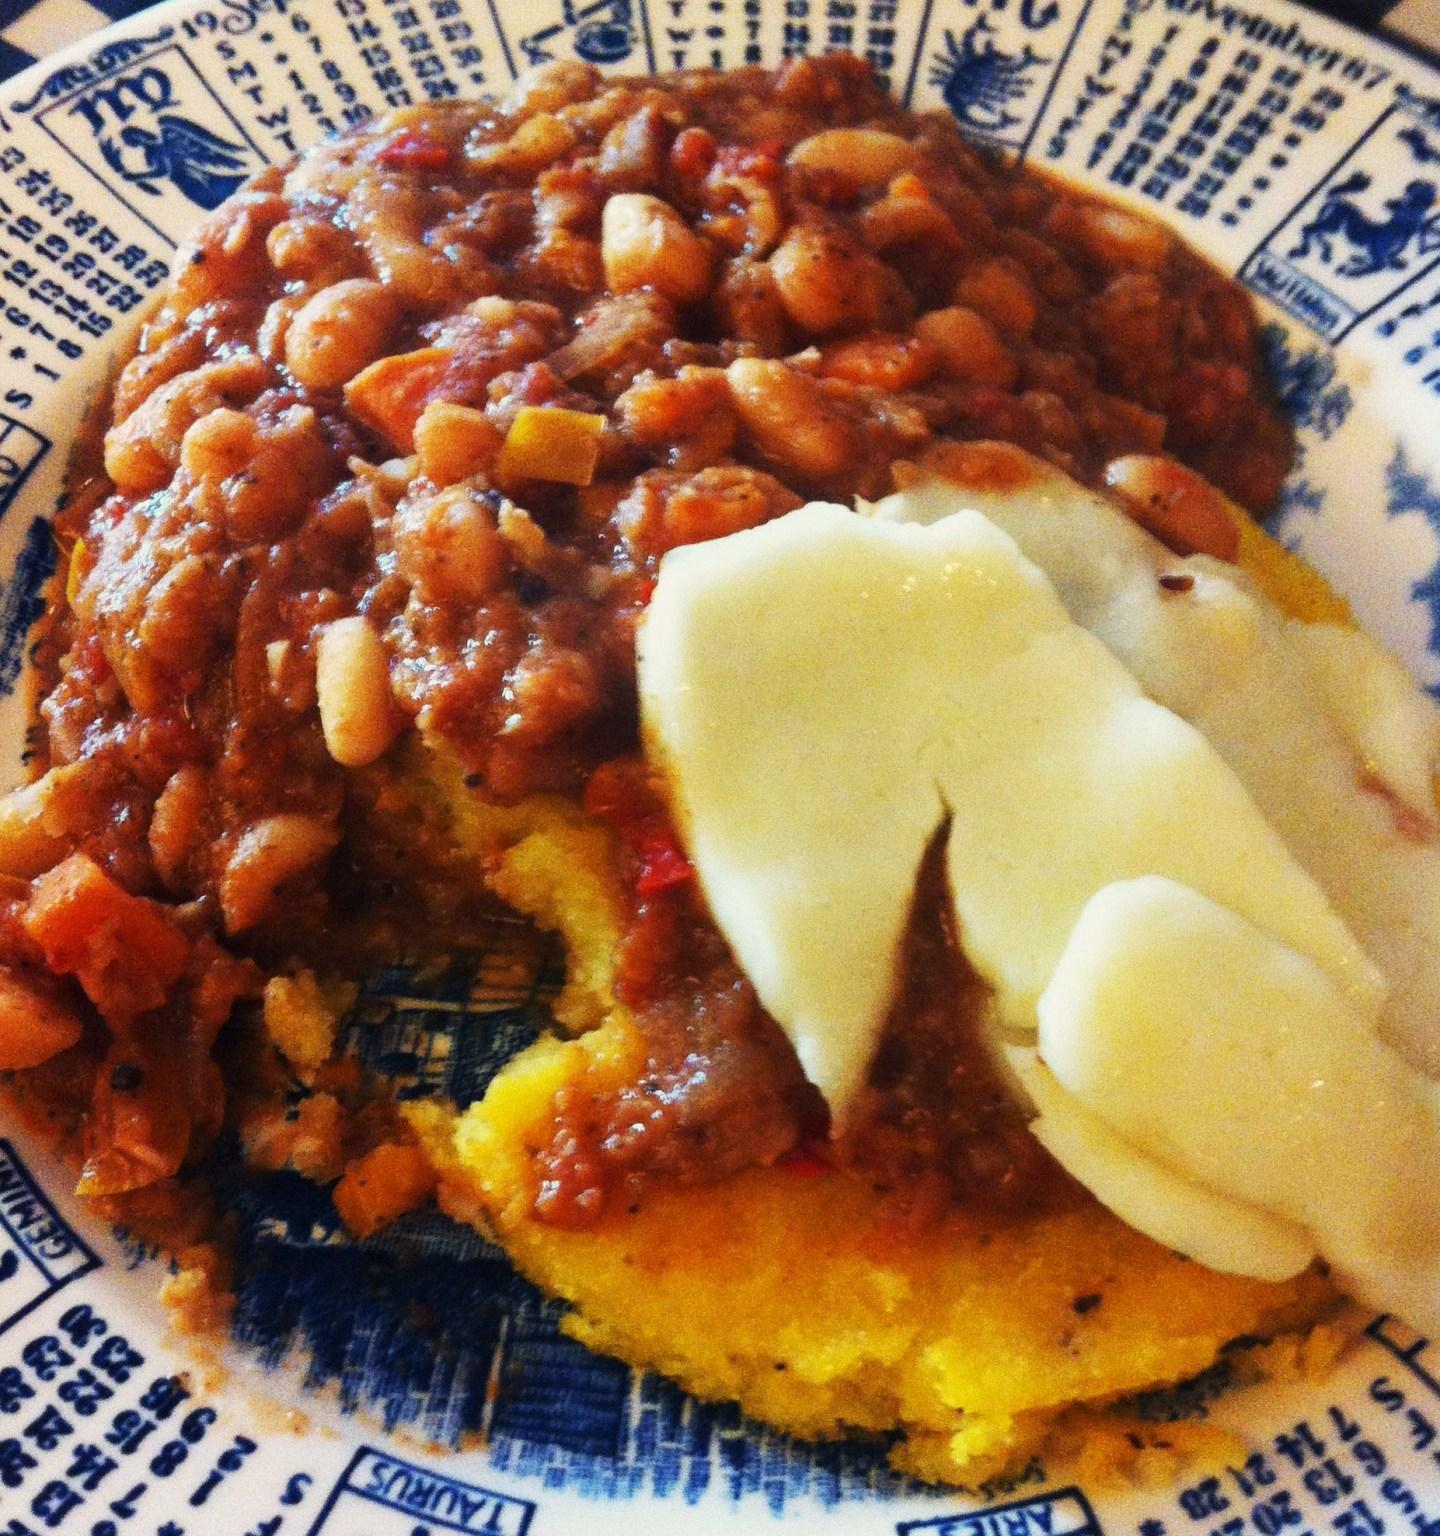 Milgi Beans on Polenta Toast with Halloumi